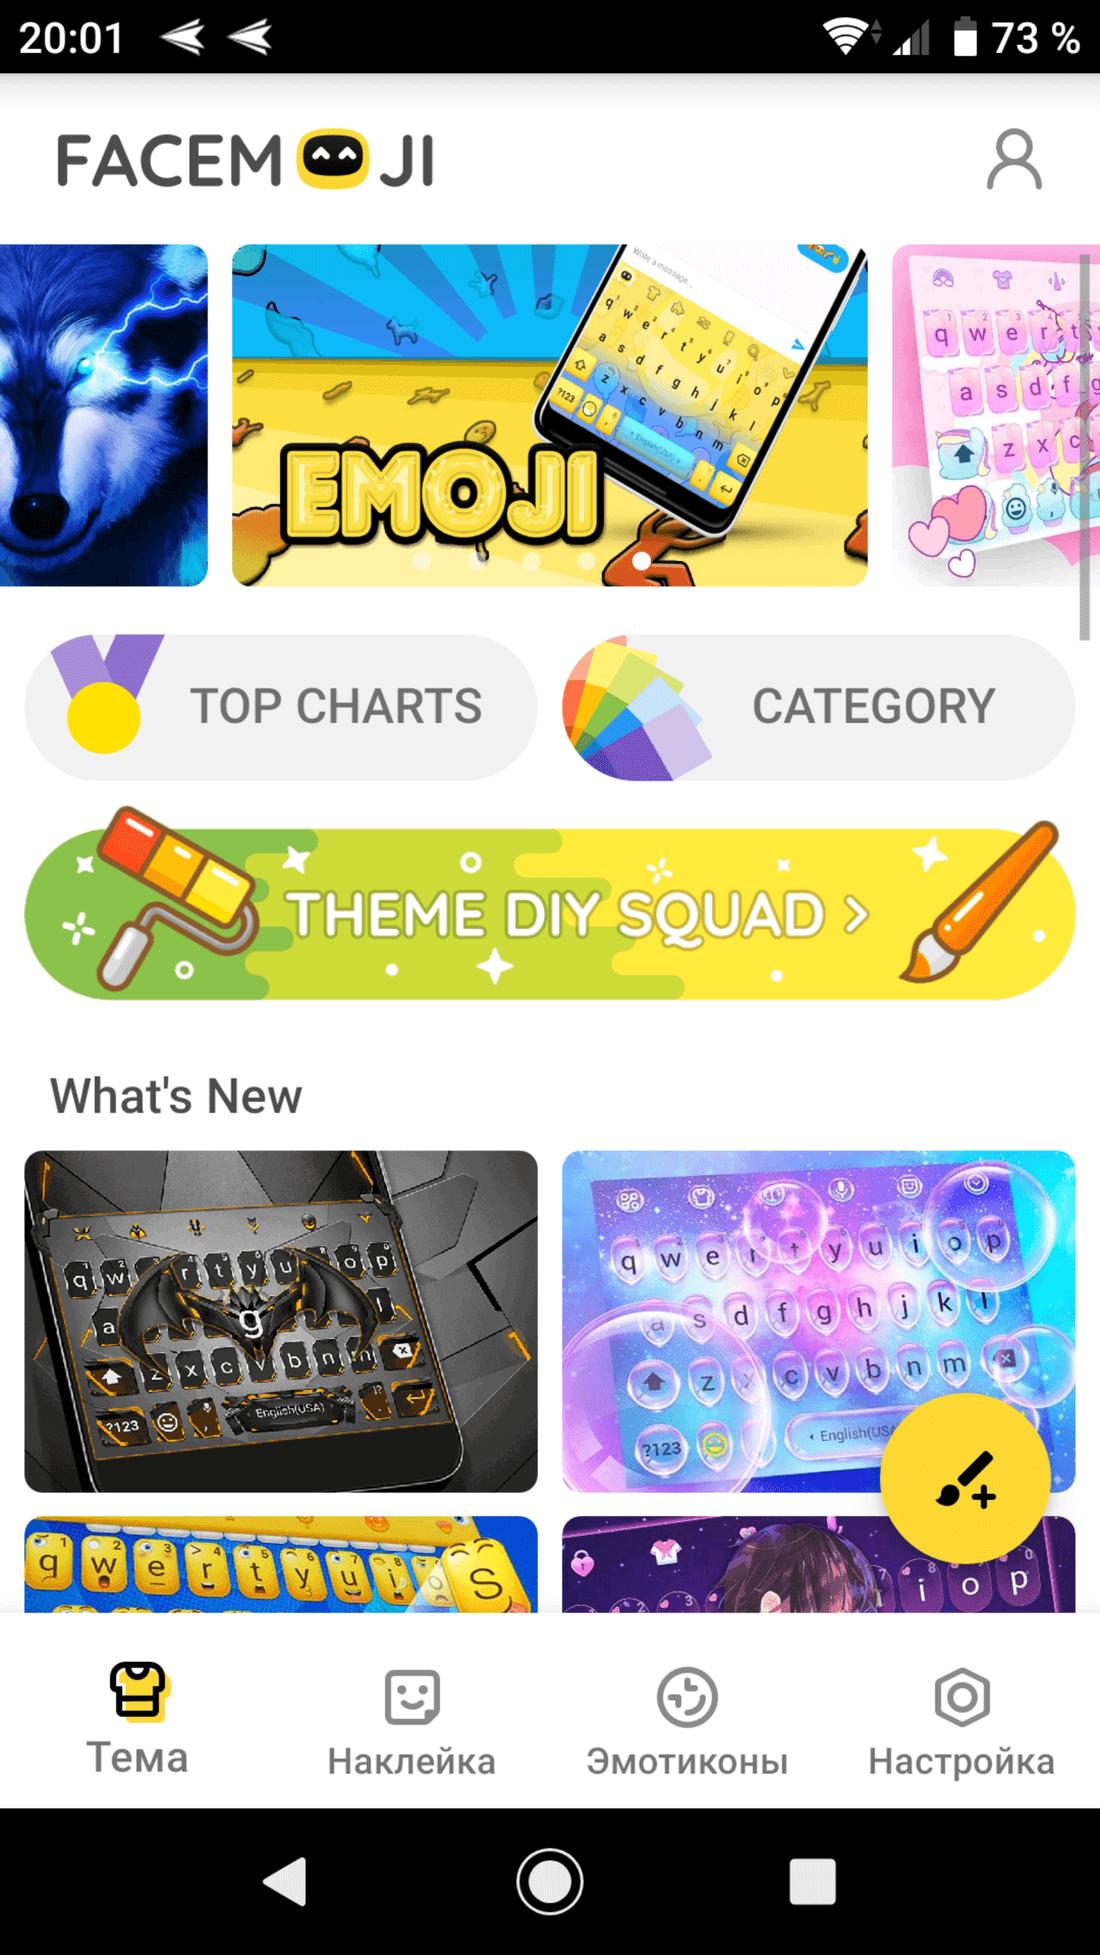 Скриншот #12 из программы Facemoji Emoji Keyboard